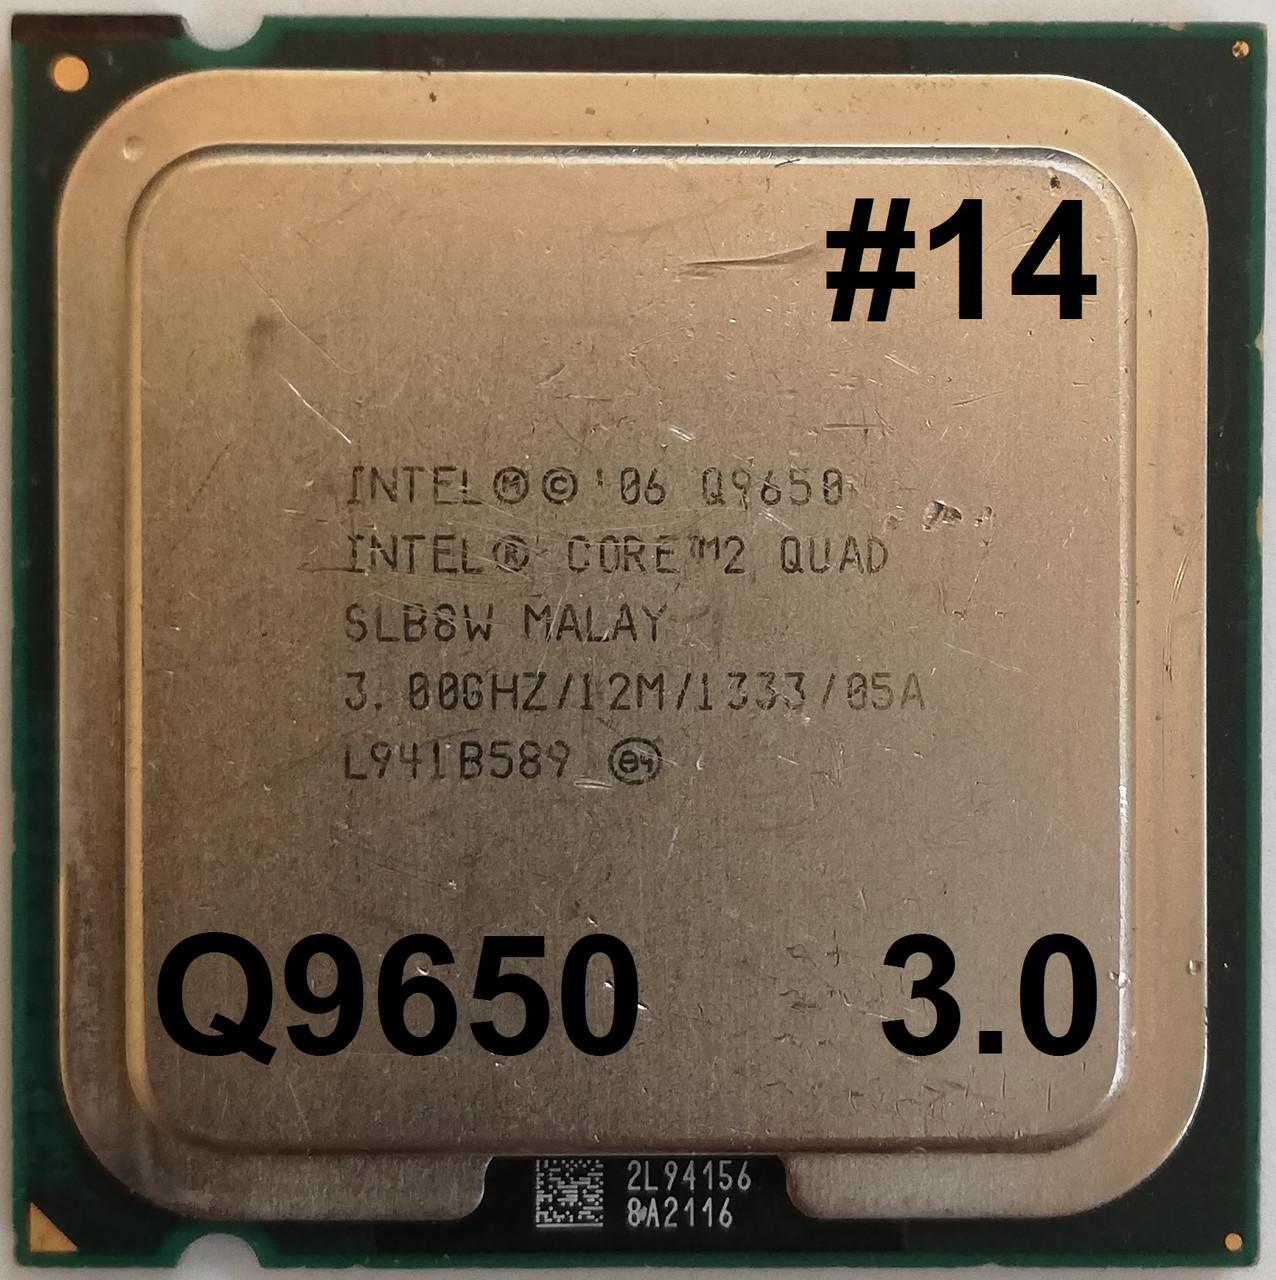 Процессор ЛОТ #14 Intel Core 2 Quad Q9650 SLB8W  3.0GHz 12M Cache 1333 MHz FSB Soket 775 Б/У